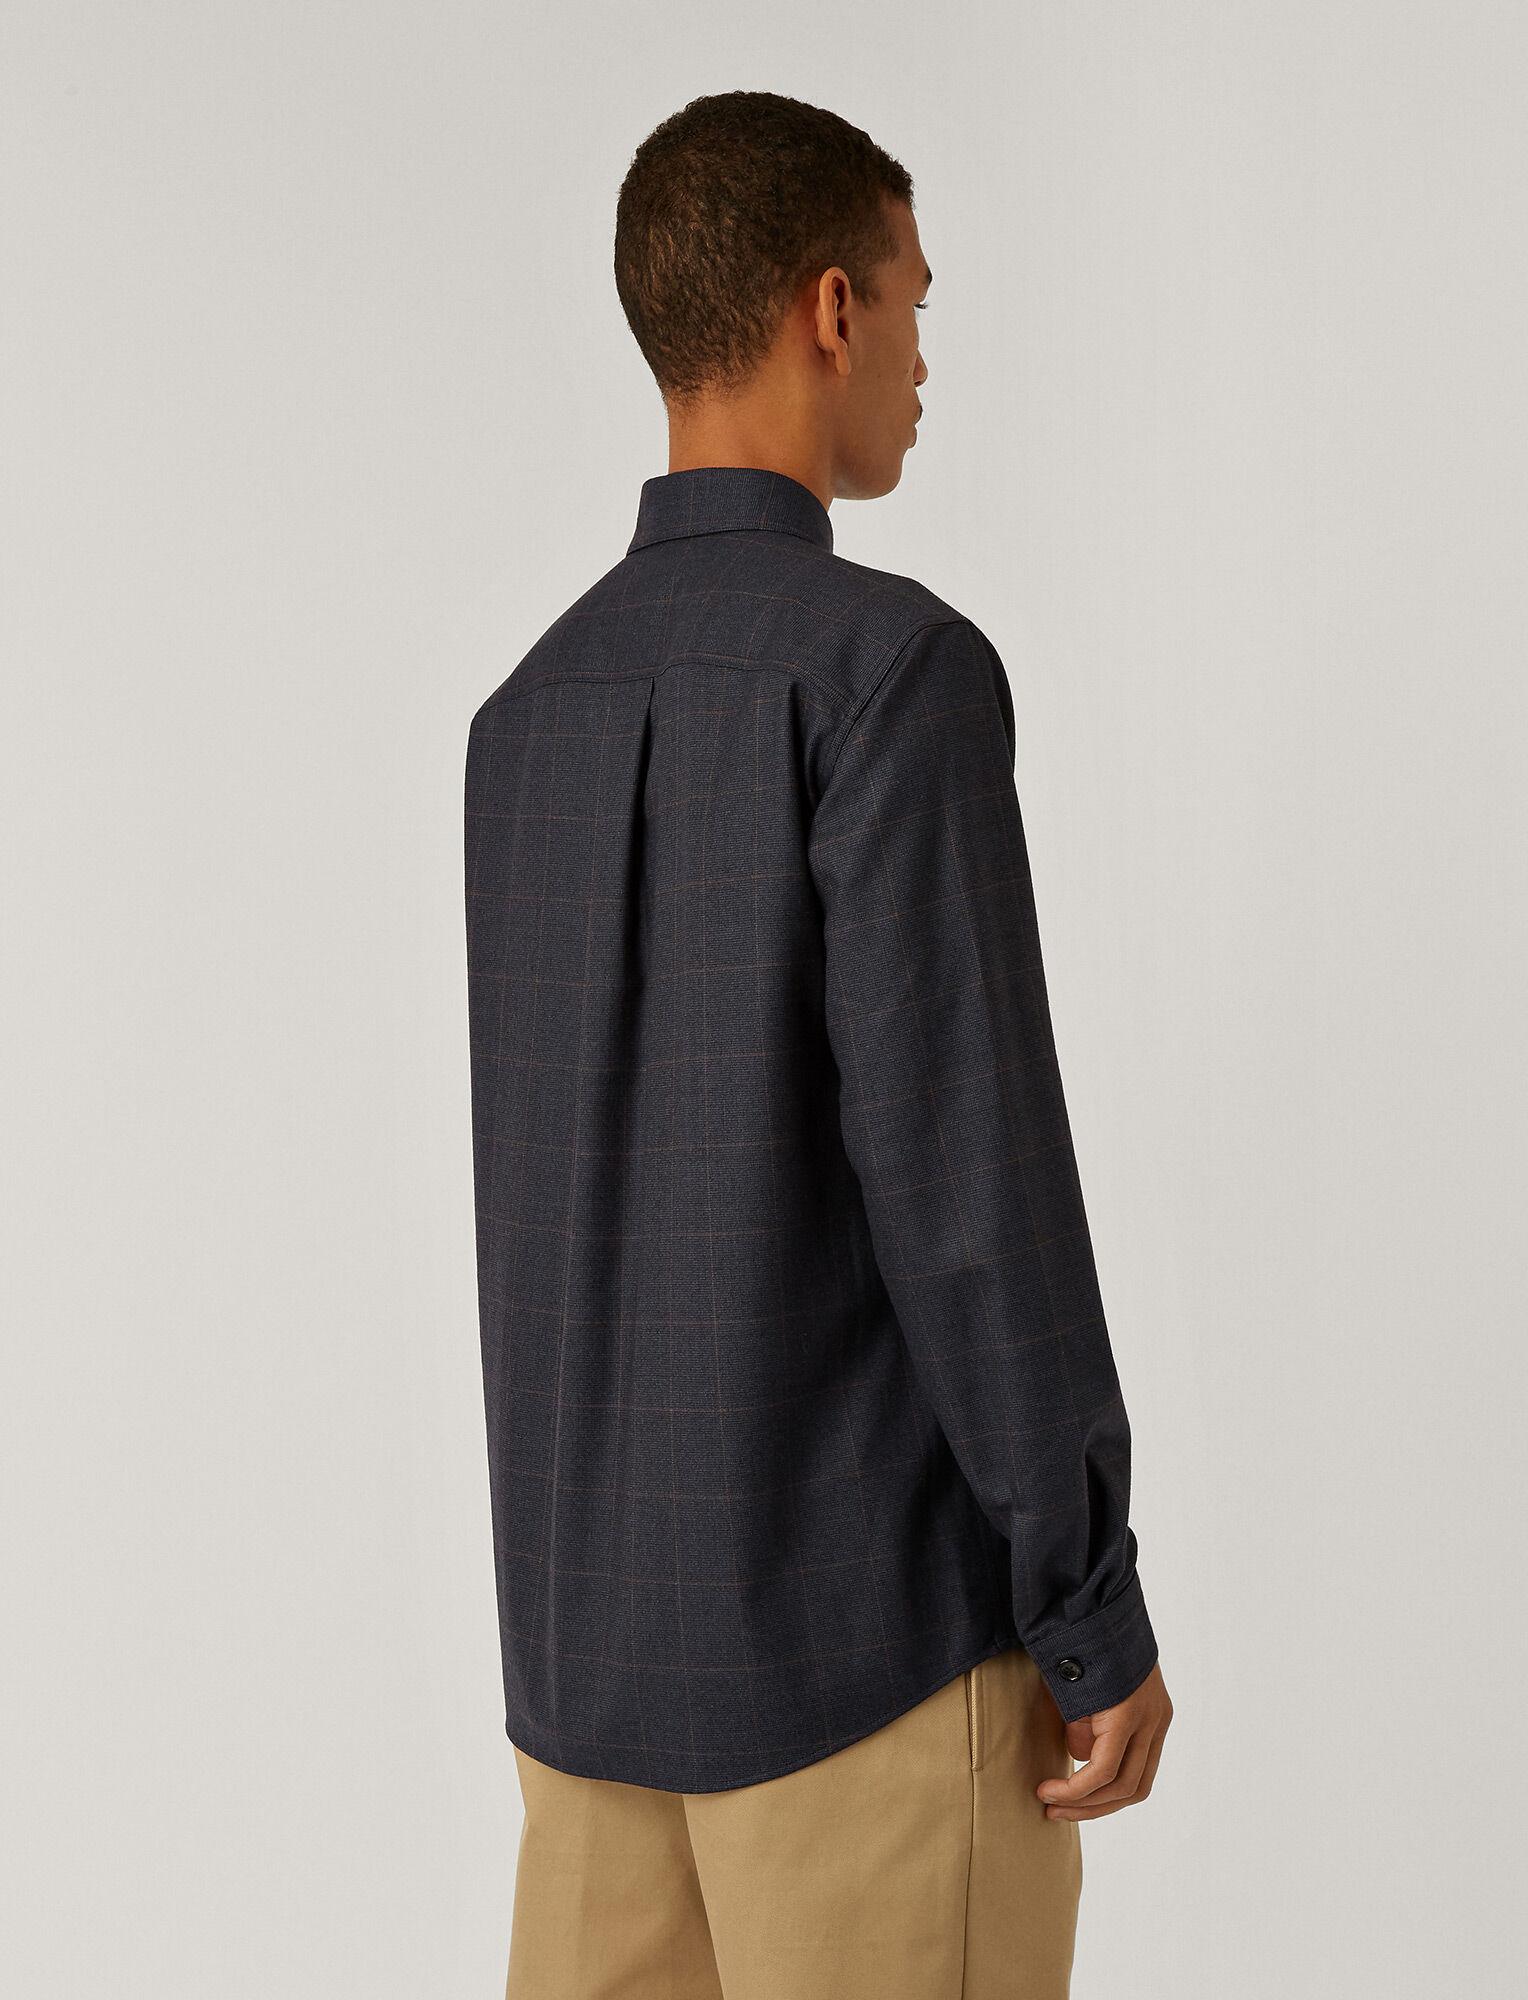 Joseph, Flannel Stretch Shirt, in NAVY